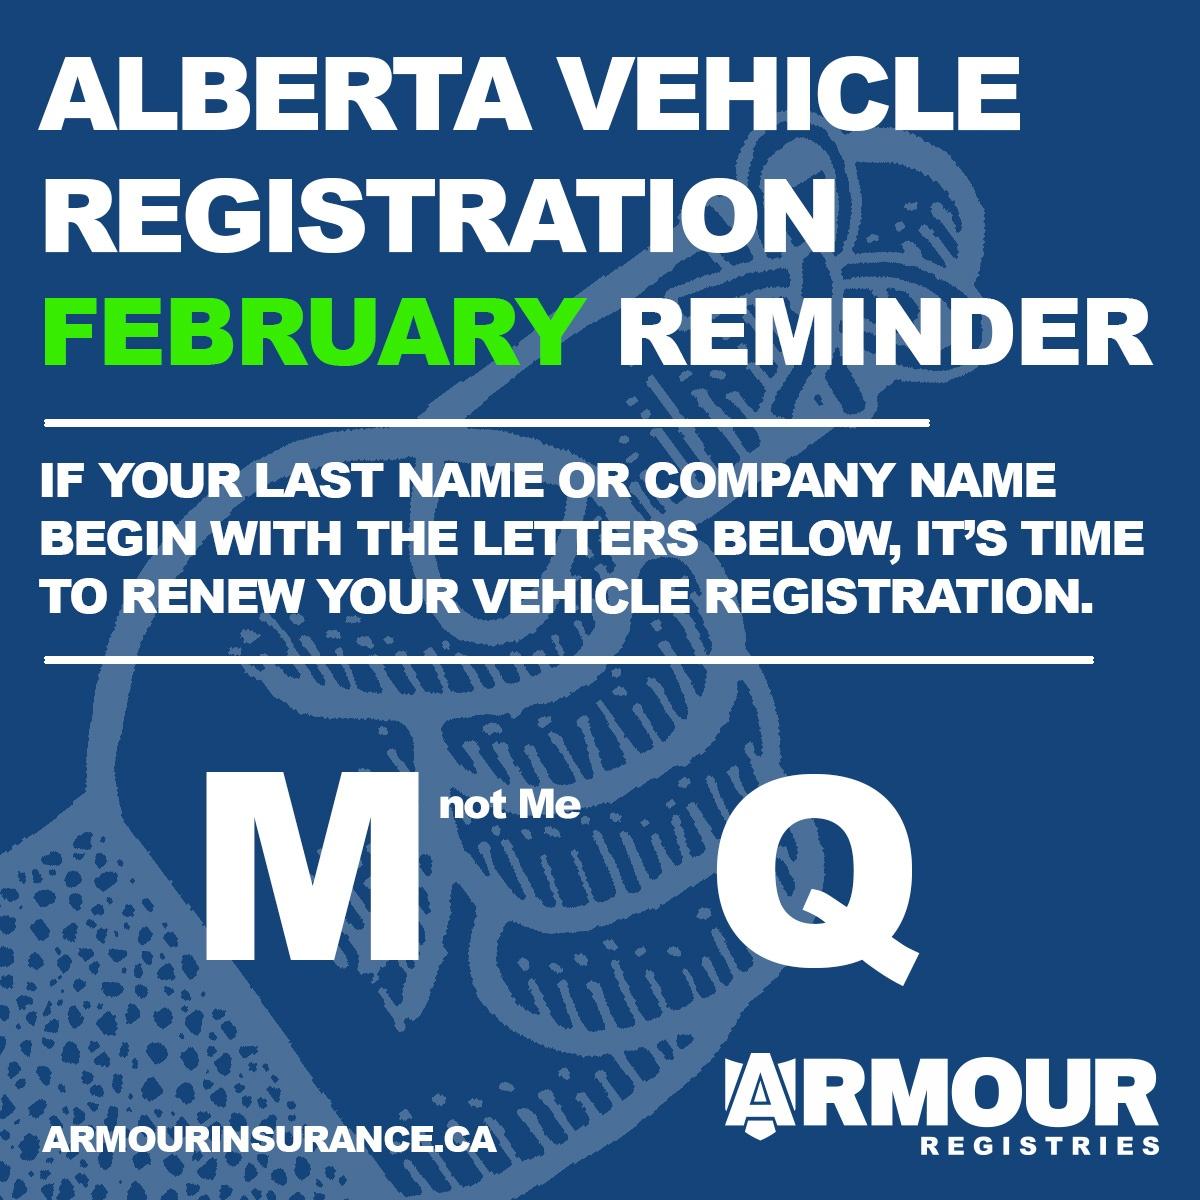 February Vehicle Registration Renewals